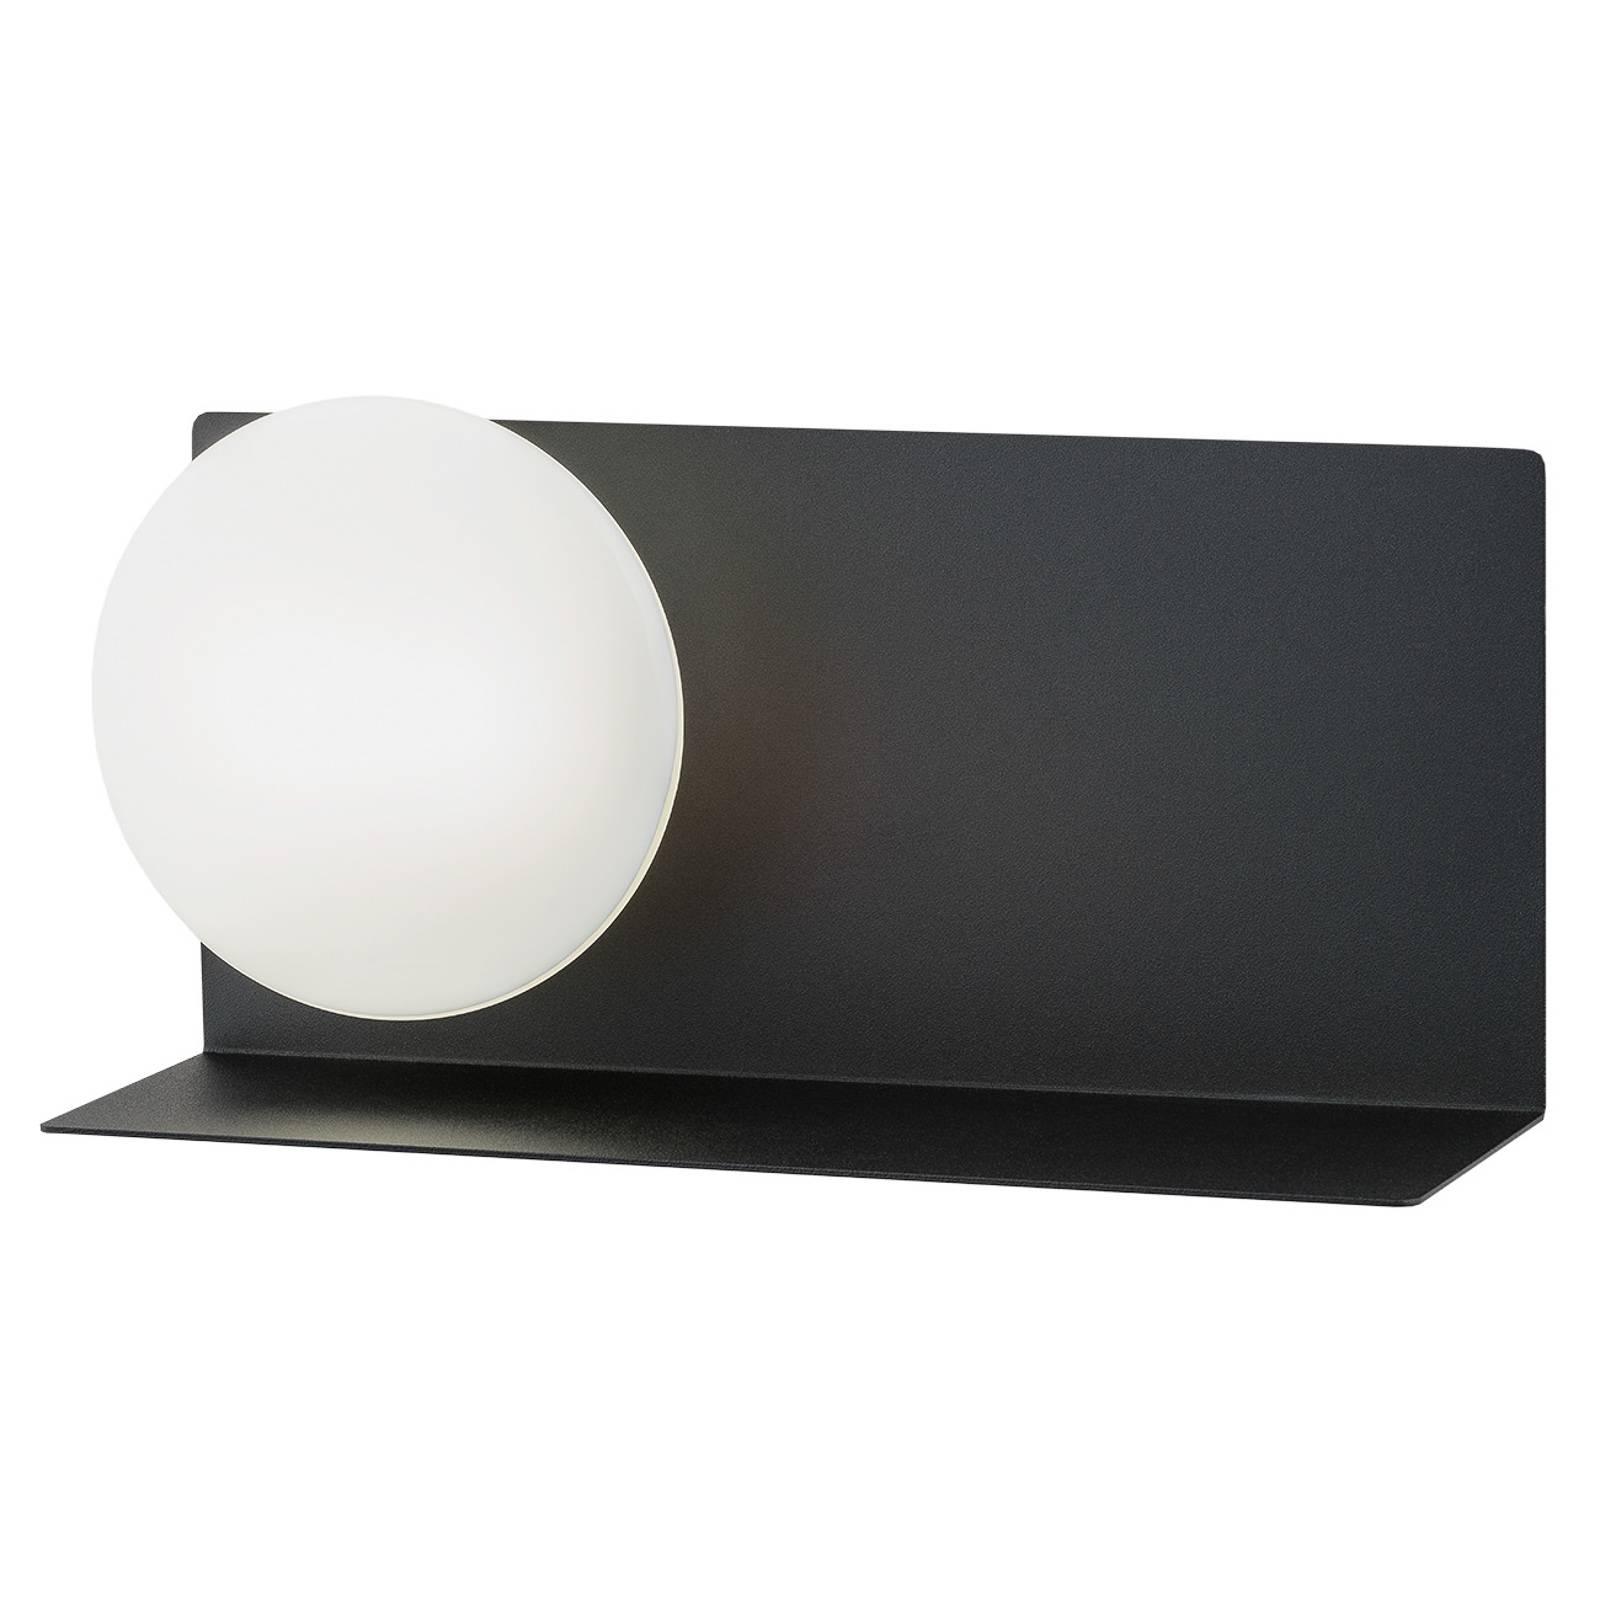 LED-seinälamppu Clark lasivarjostimella, musta